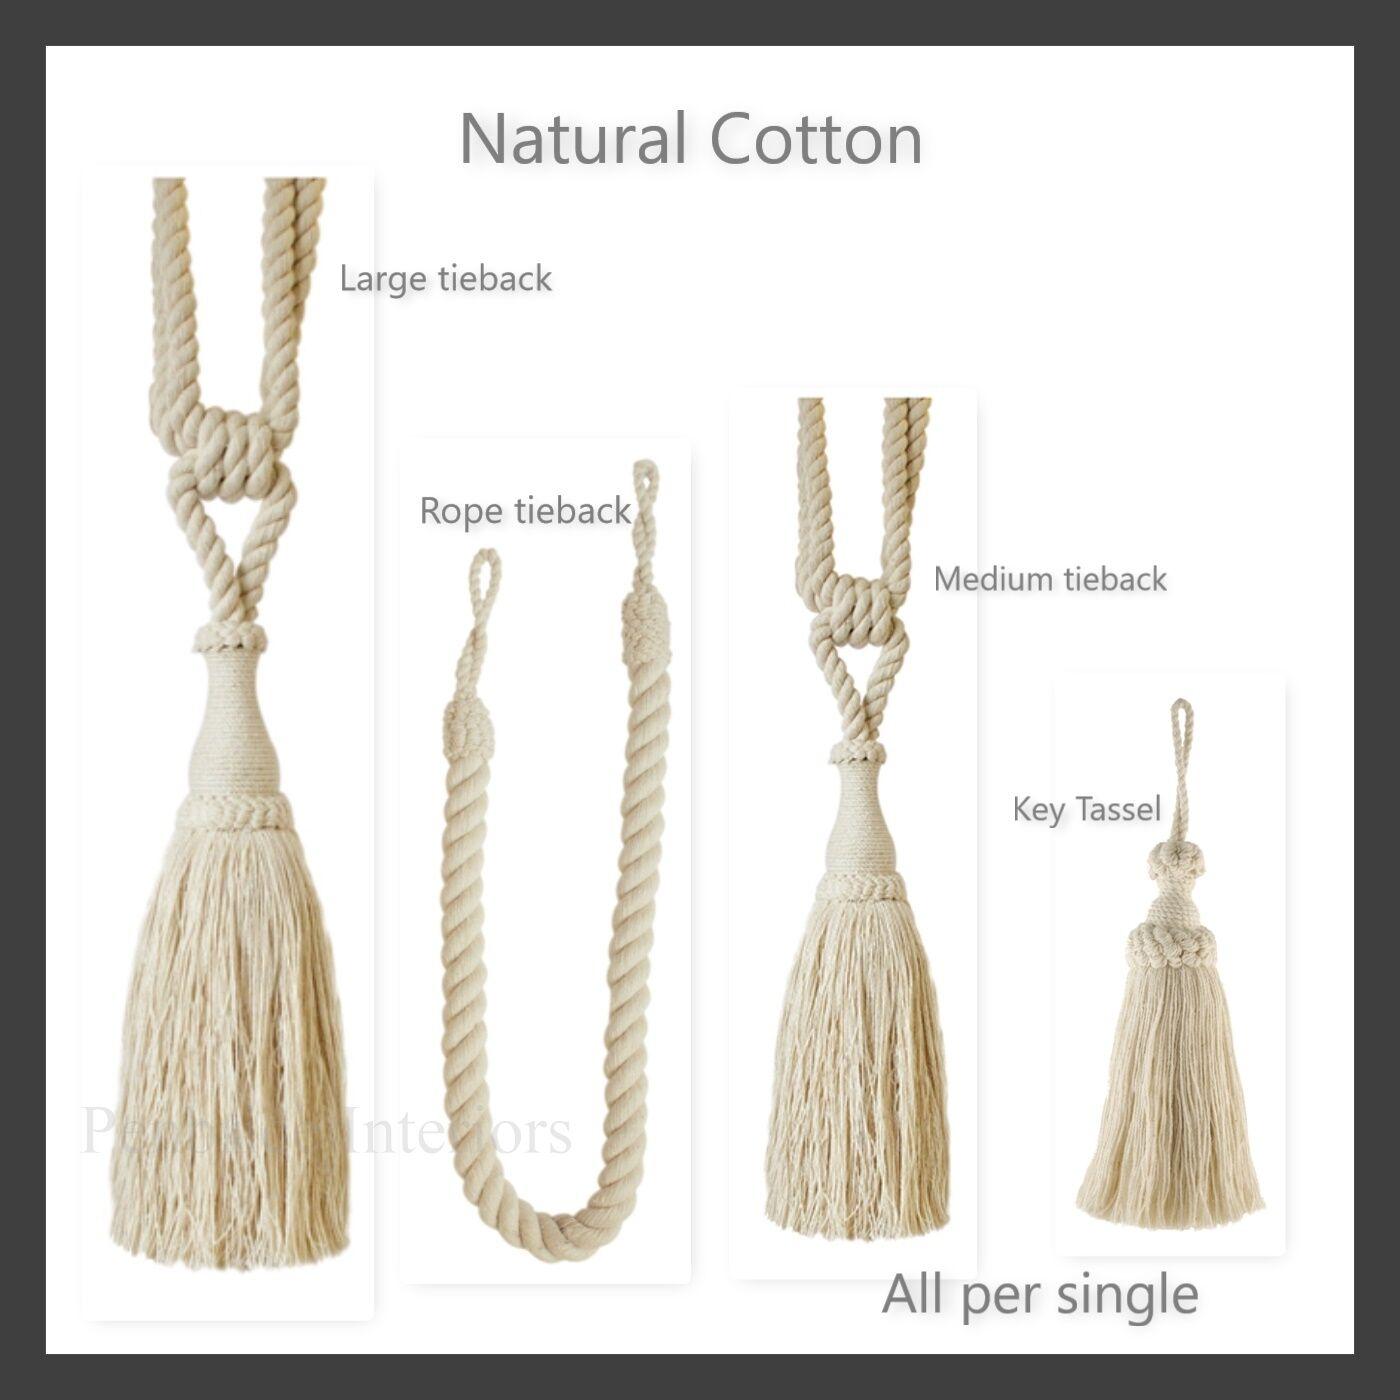 1 Natural Cotton Curtain Tieback Rope Key Tassel Per single Tie Back